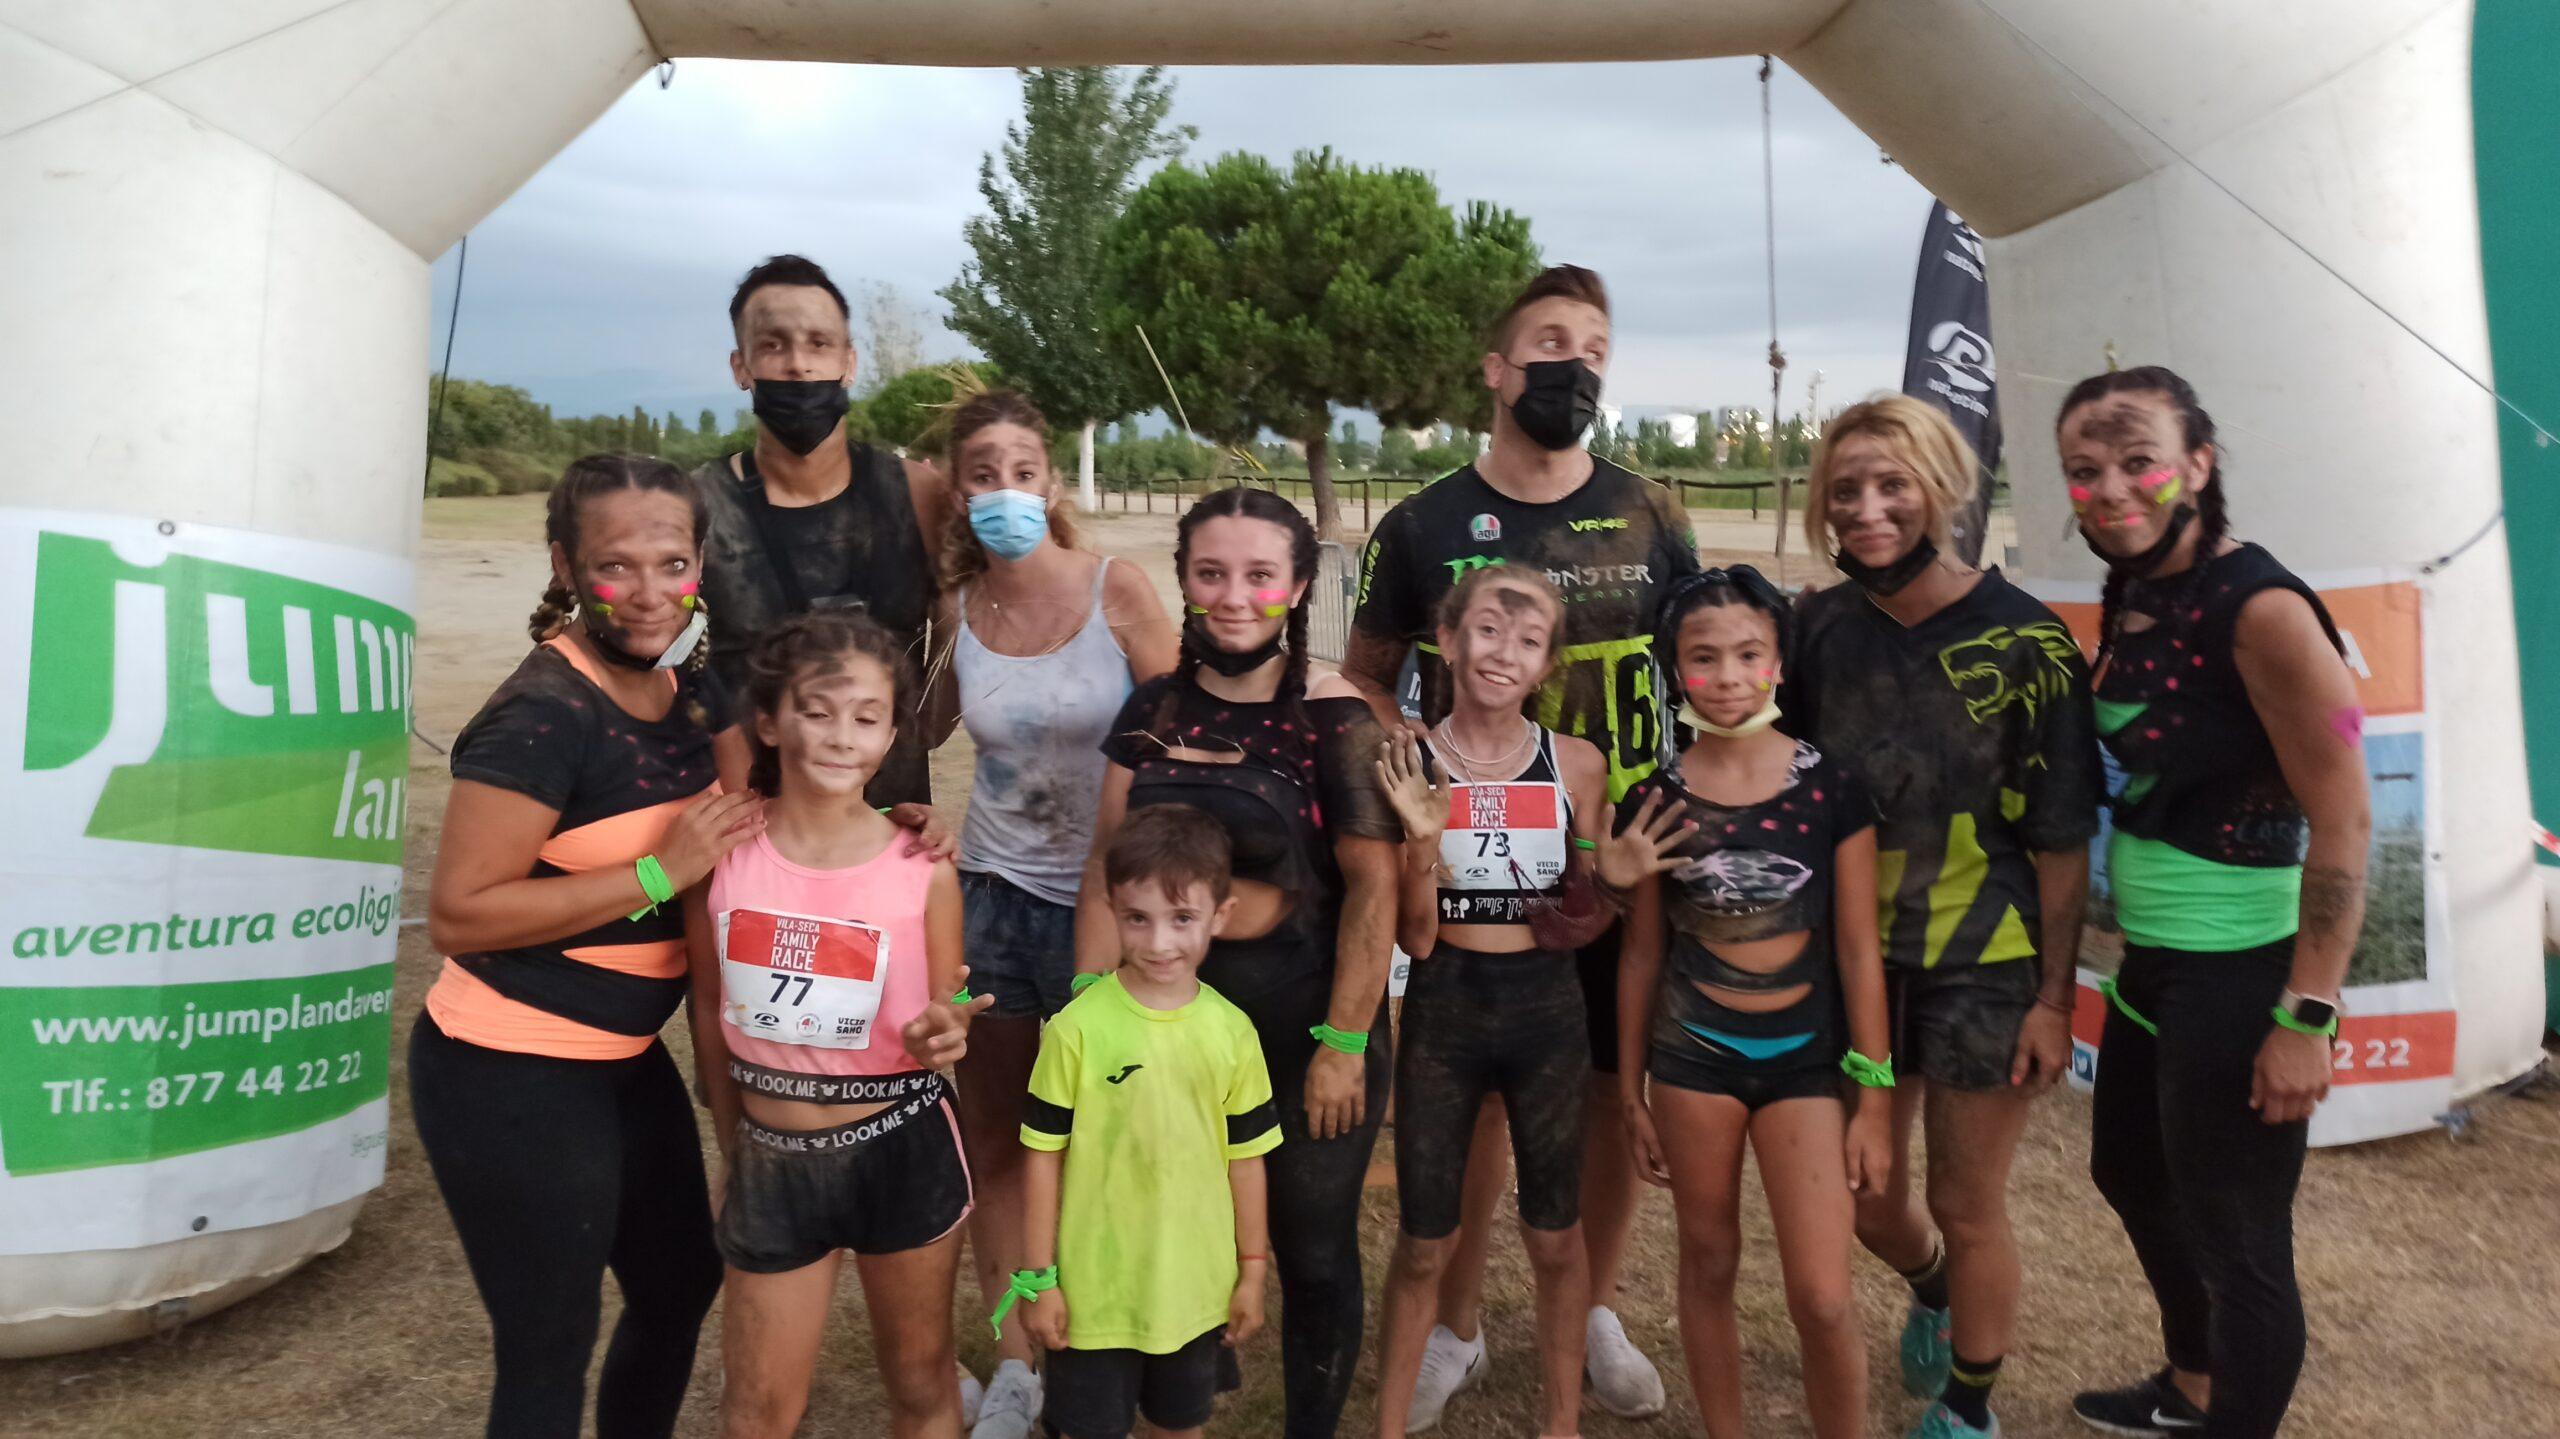 vila-seca family race 2021